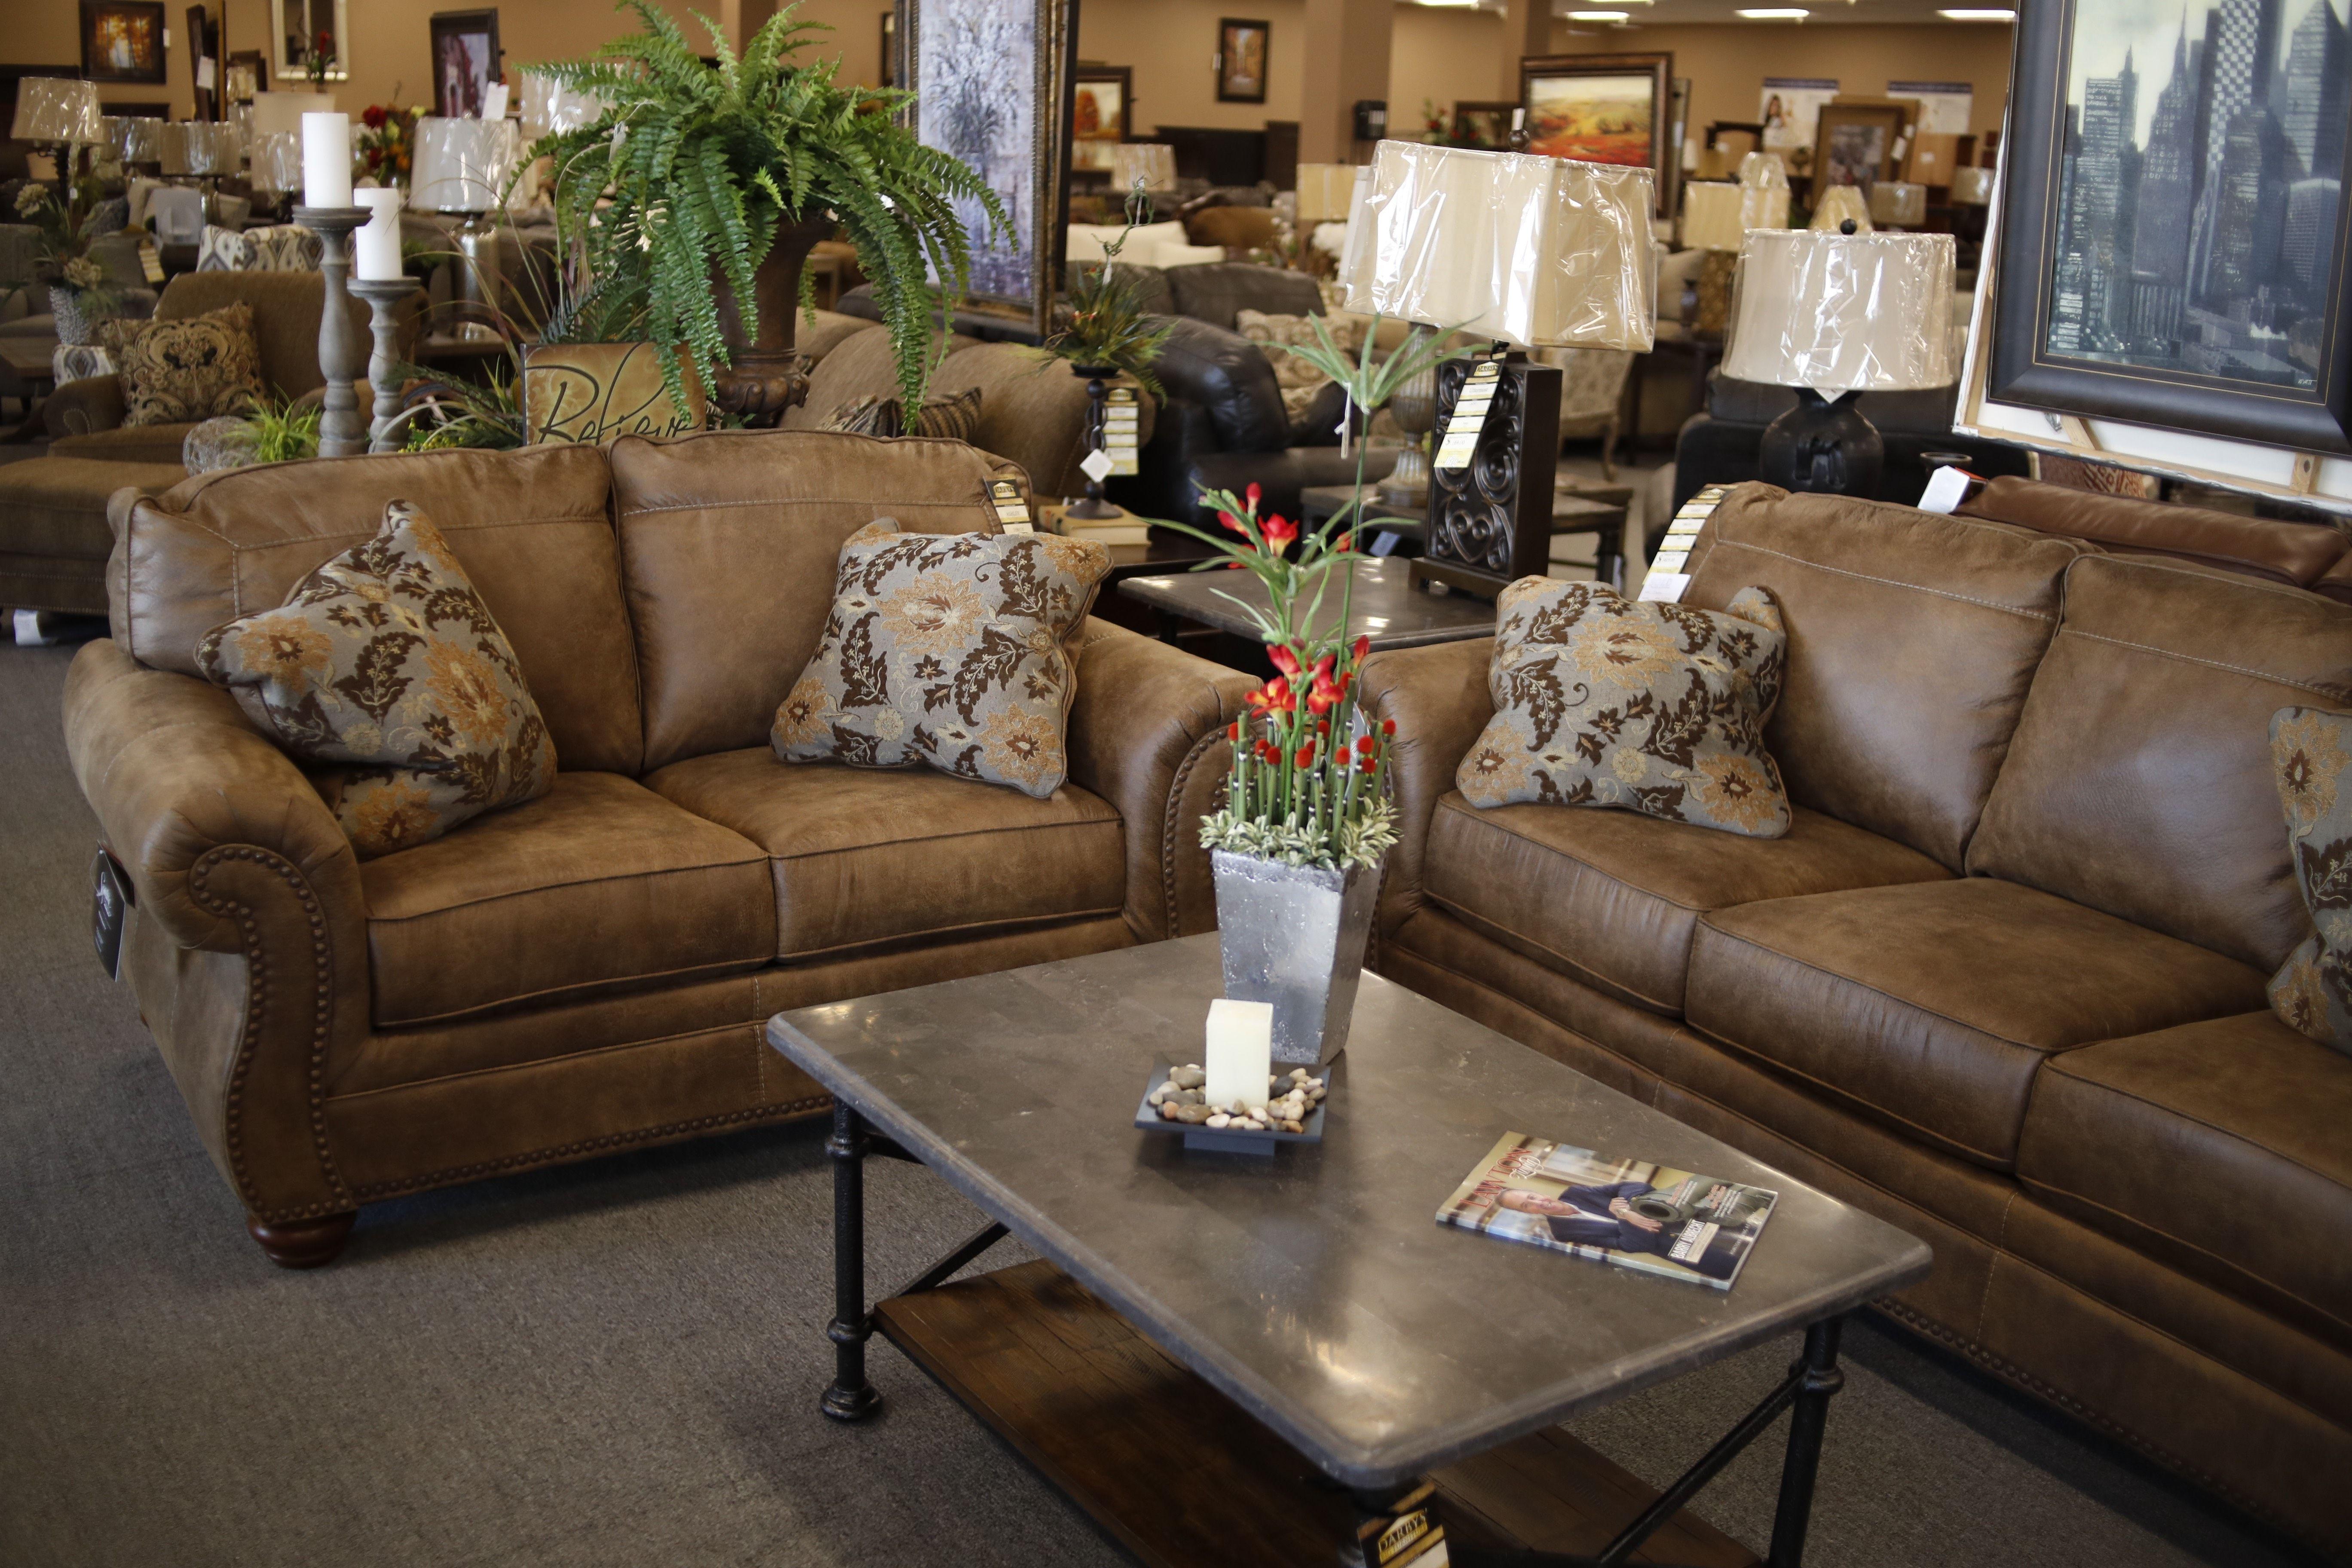 Ideadarbys' Big Furniture On Darbys' Big Furniture Store with regard to Rustic Furniture Lawton Ok